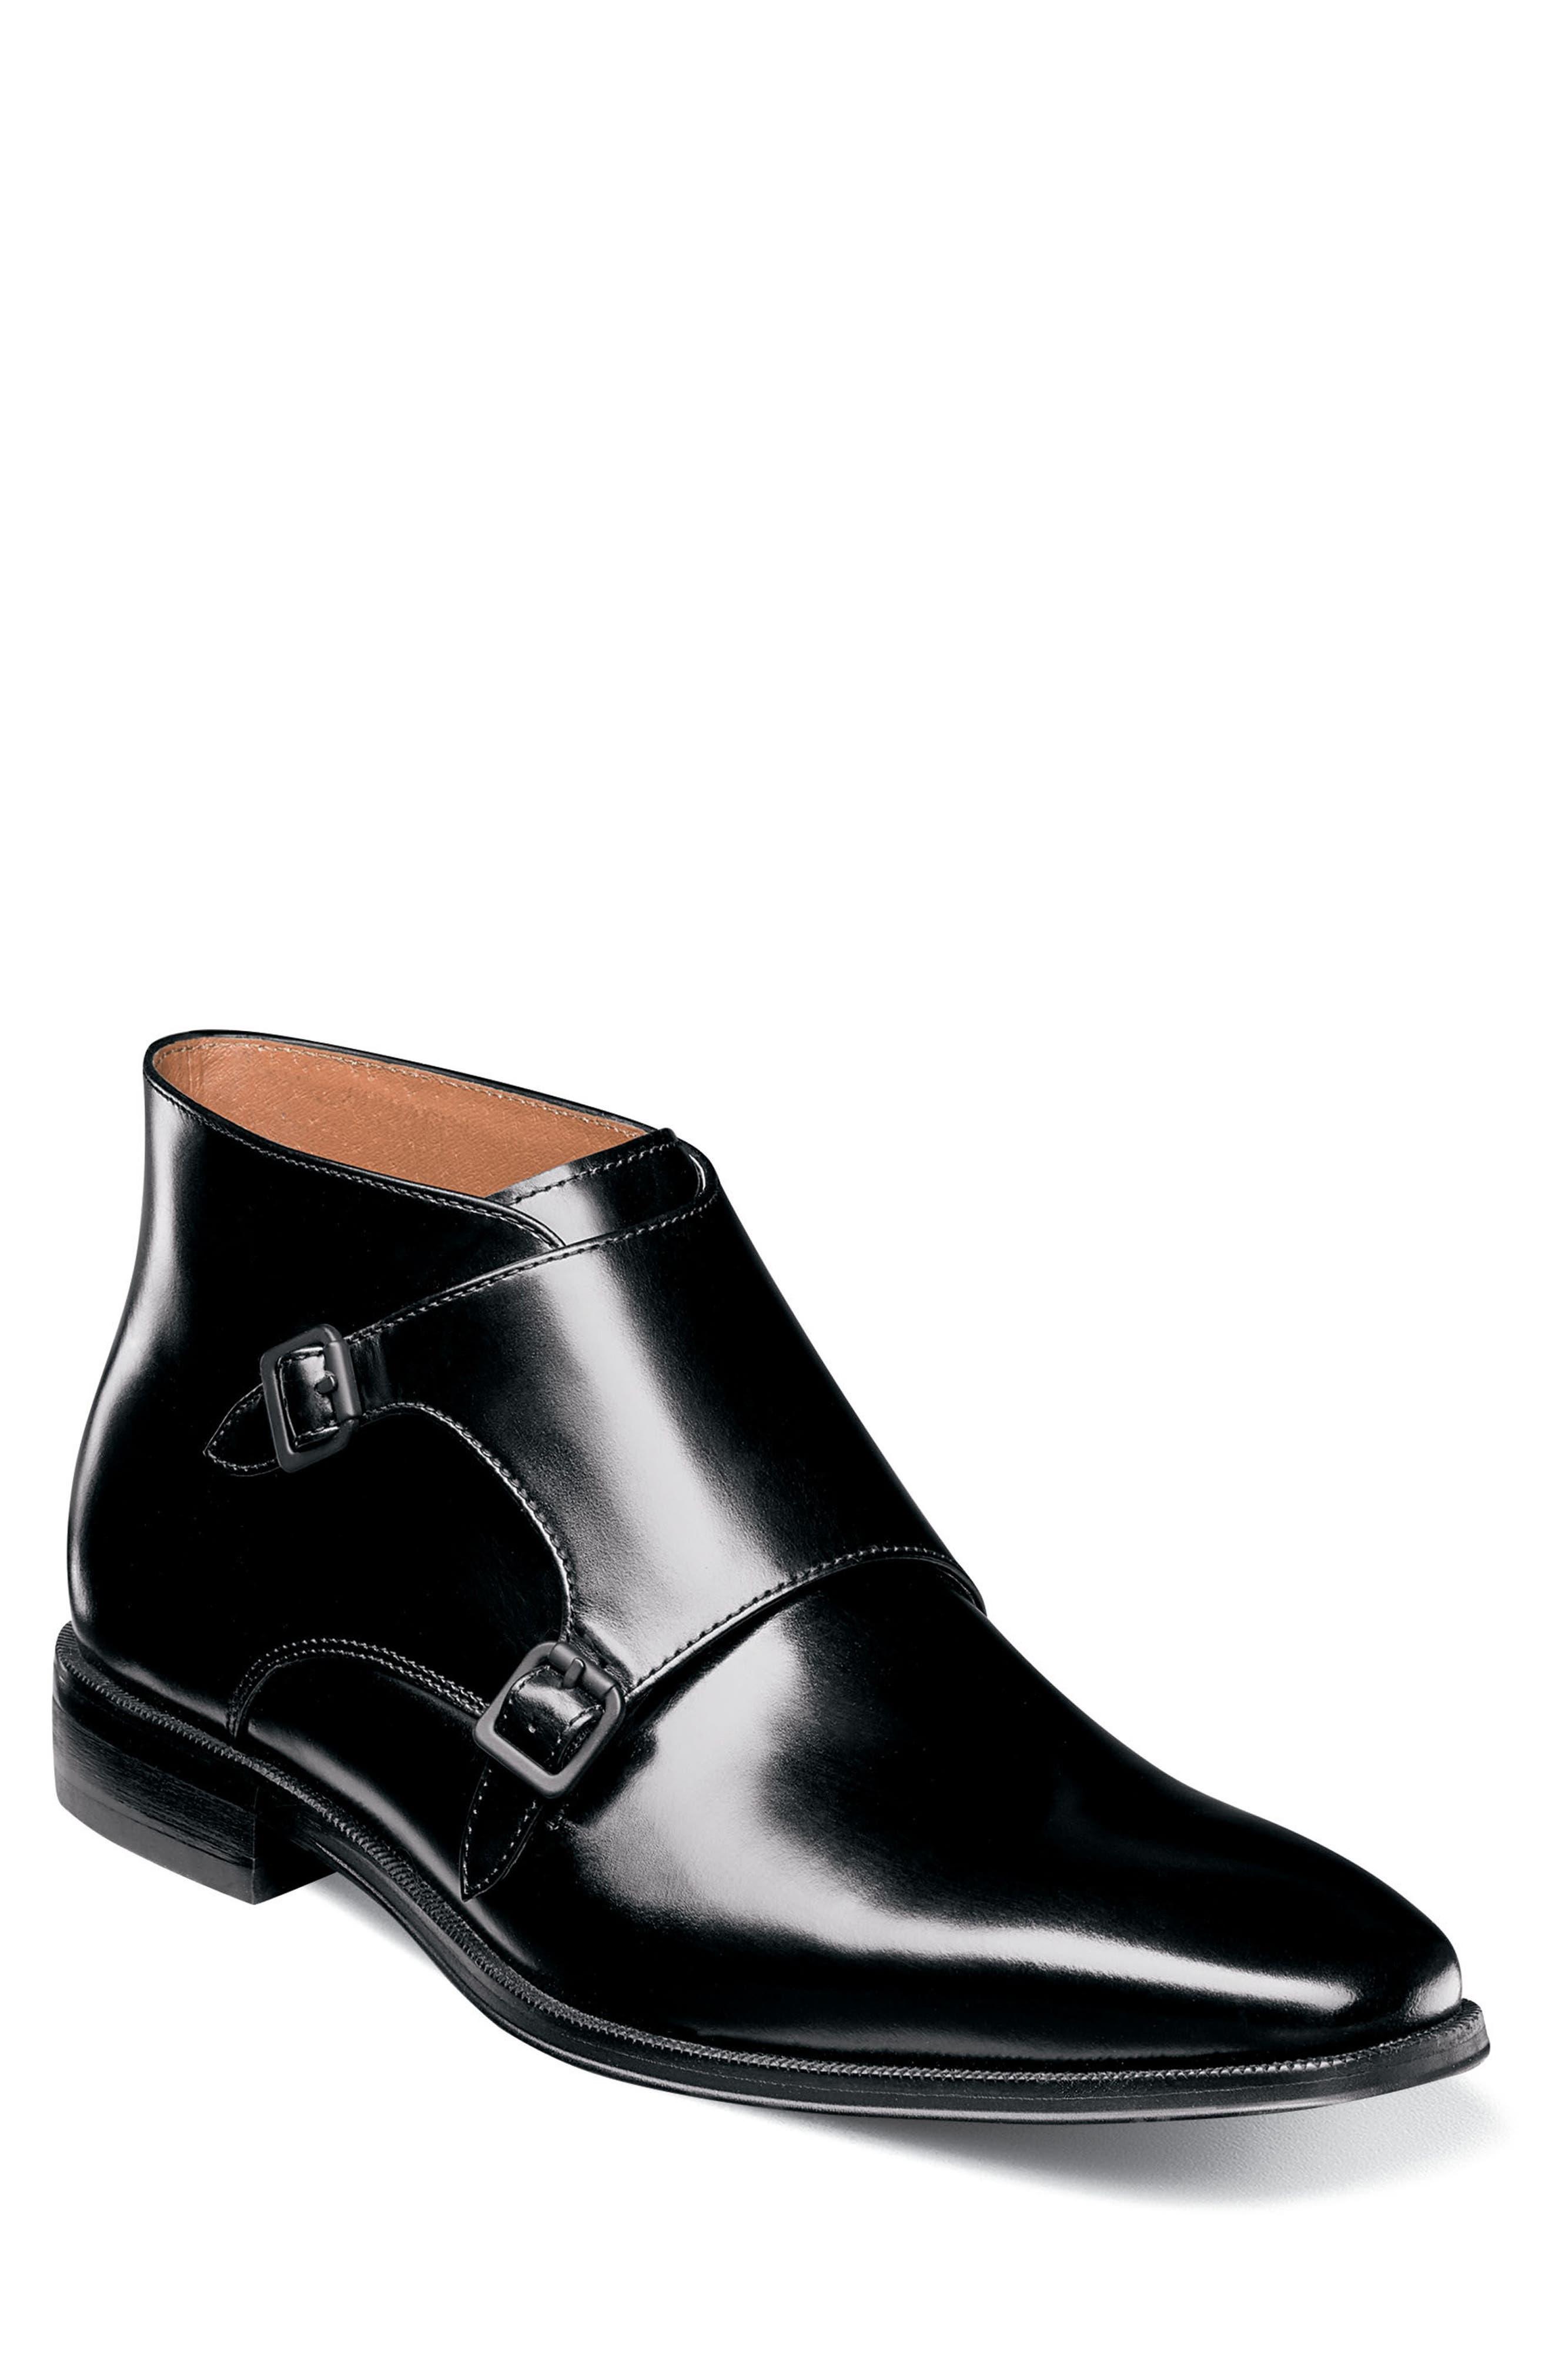 FLORSHEIM Belfast Double Monk Strap Boot